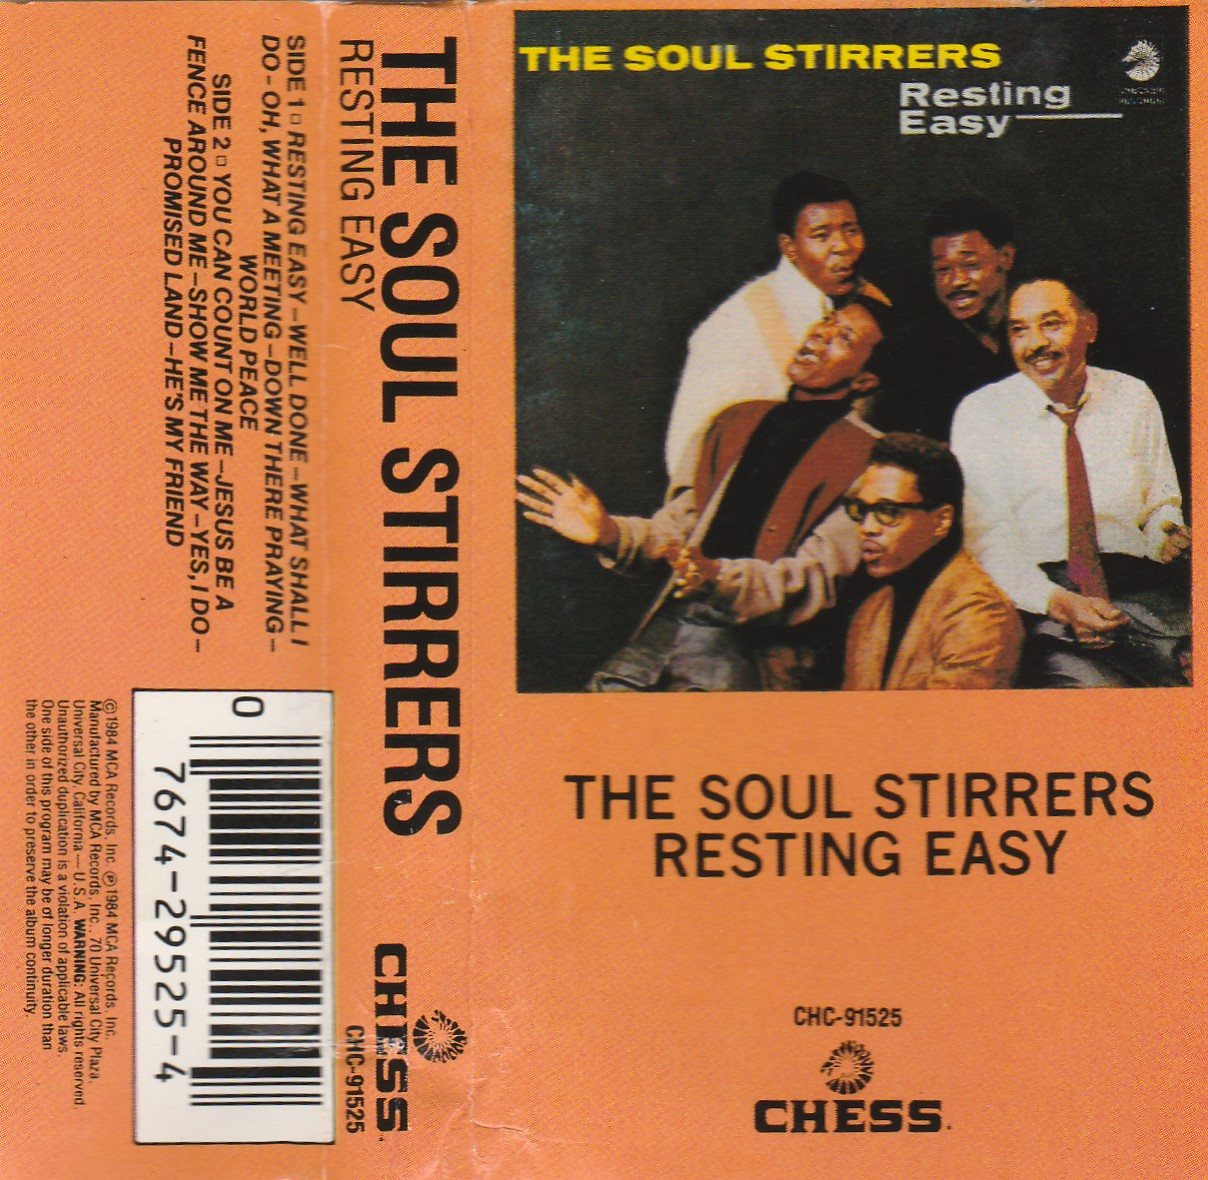 The Soul Stirrers Praying Ground No Need To Worry